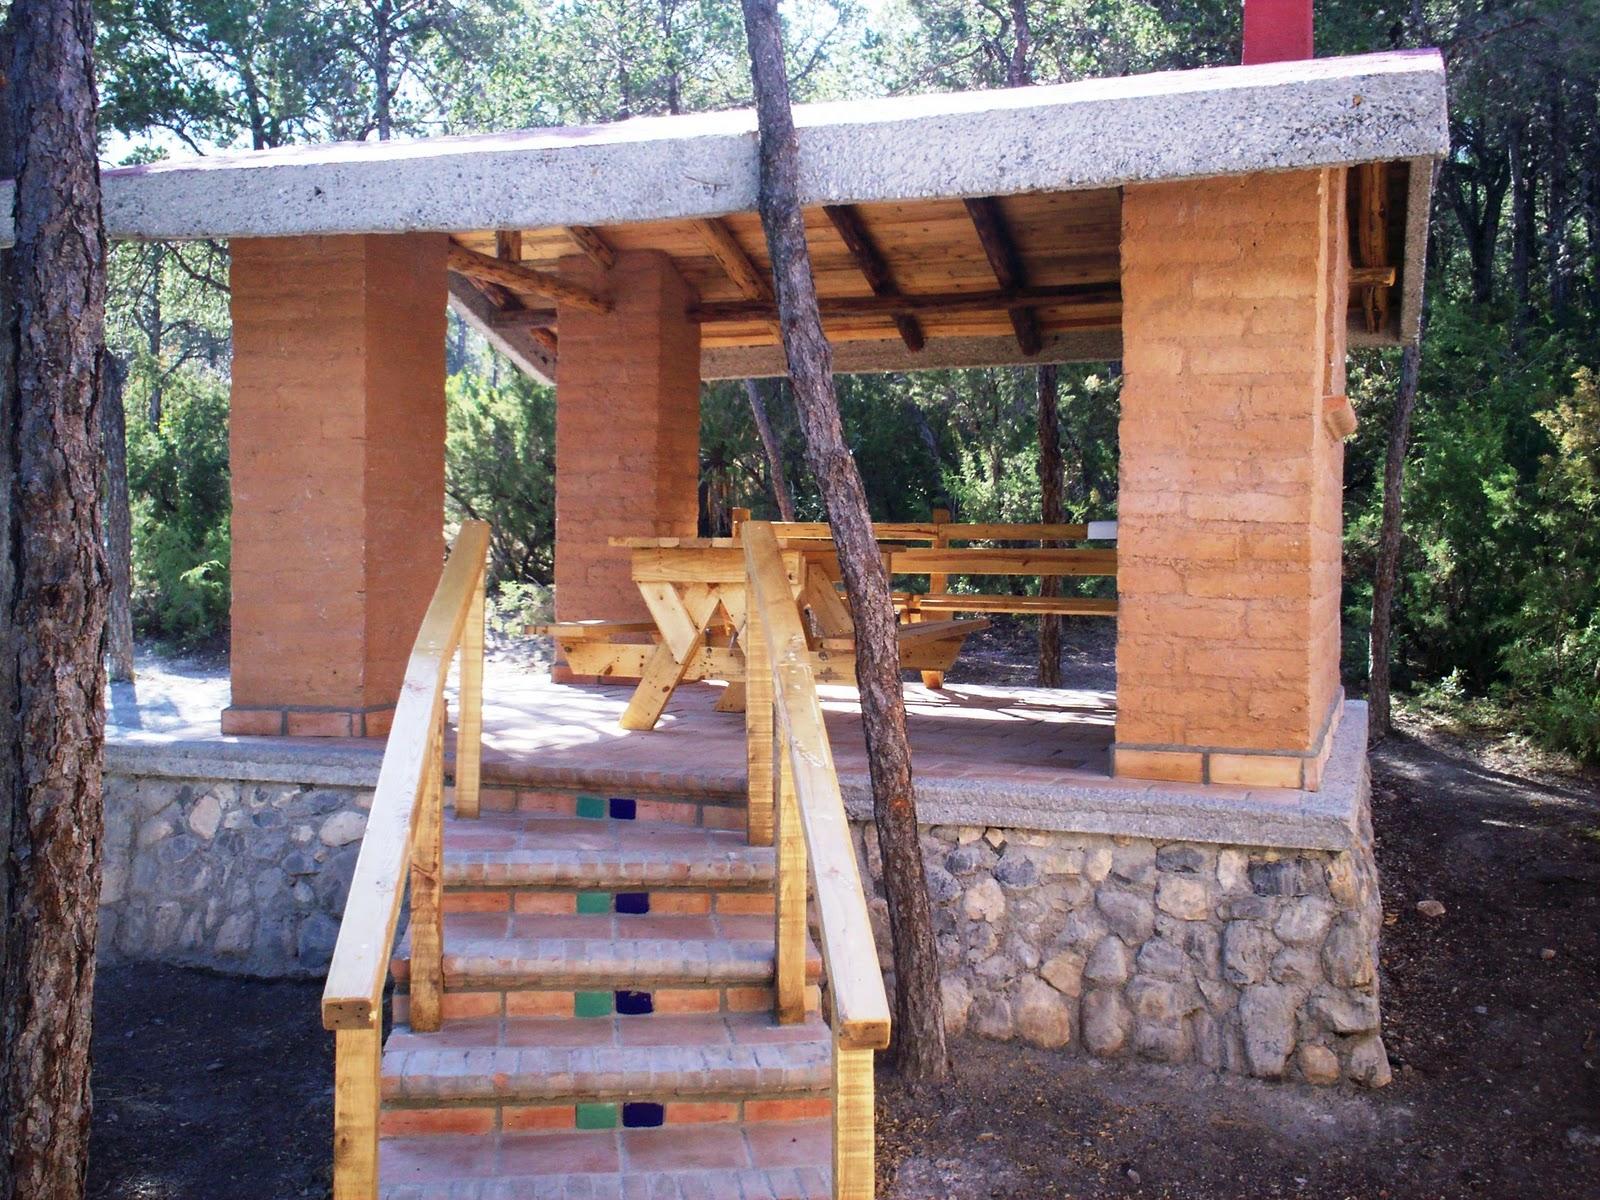 Caba as en adobe artesanal caba as en adobe artesanal - Escaleras de madera rusticas ...